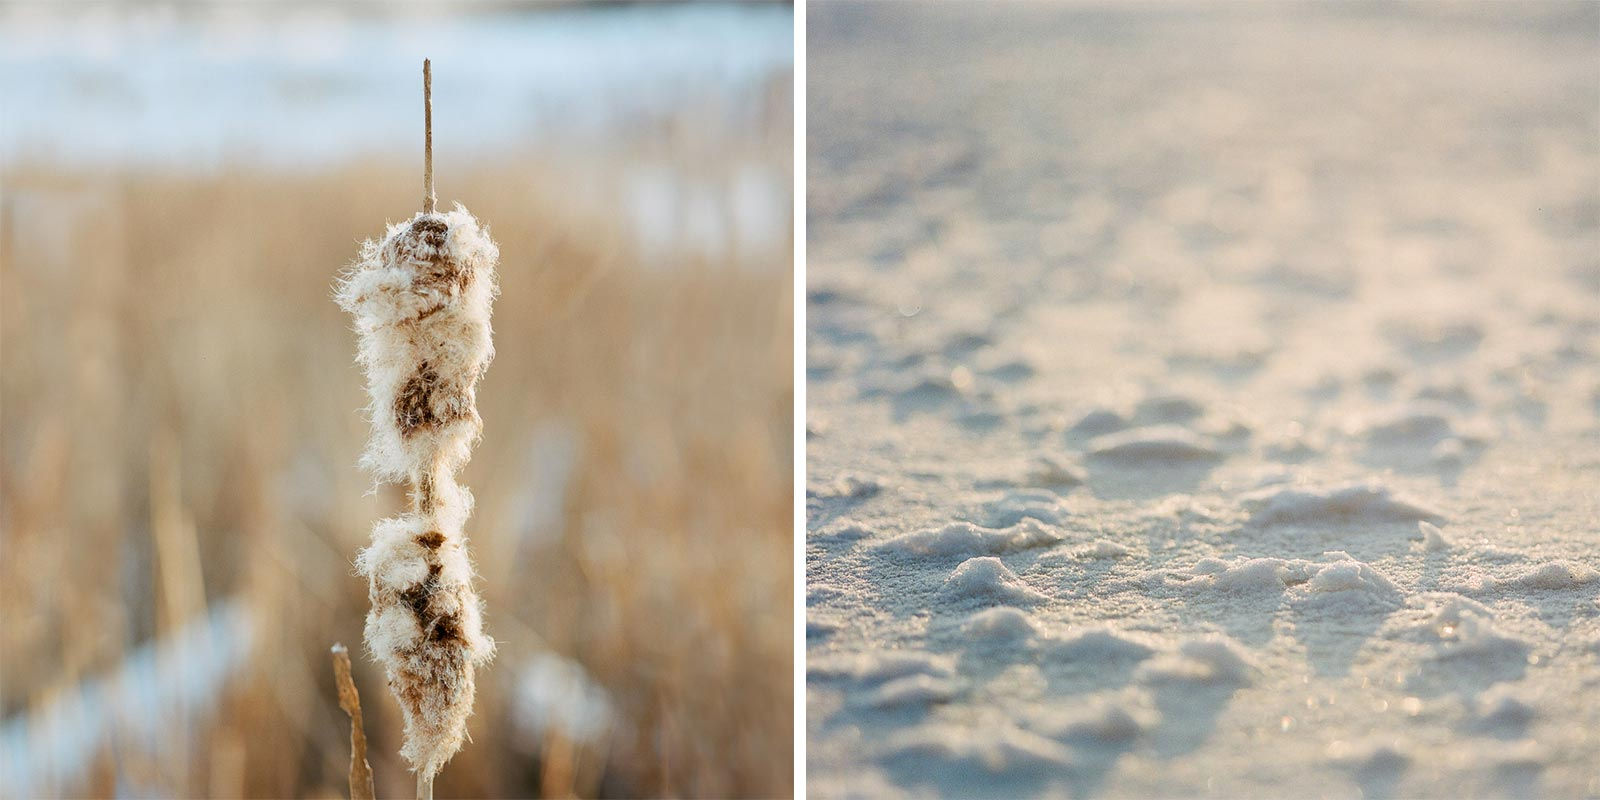 minnesota-winter-landscape-photography-02.jpg